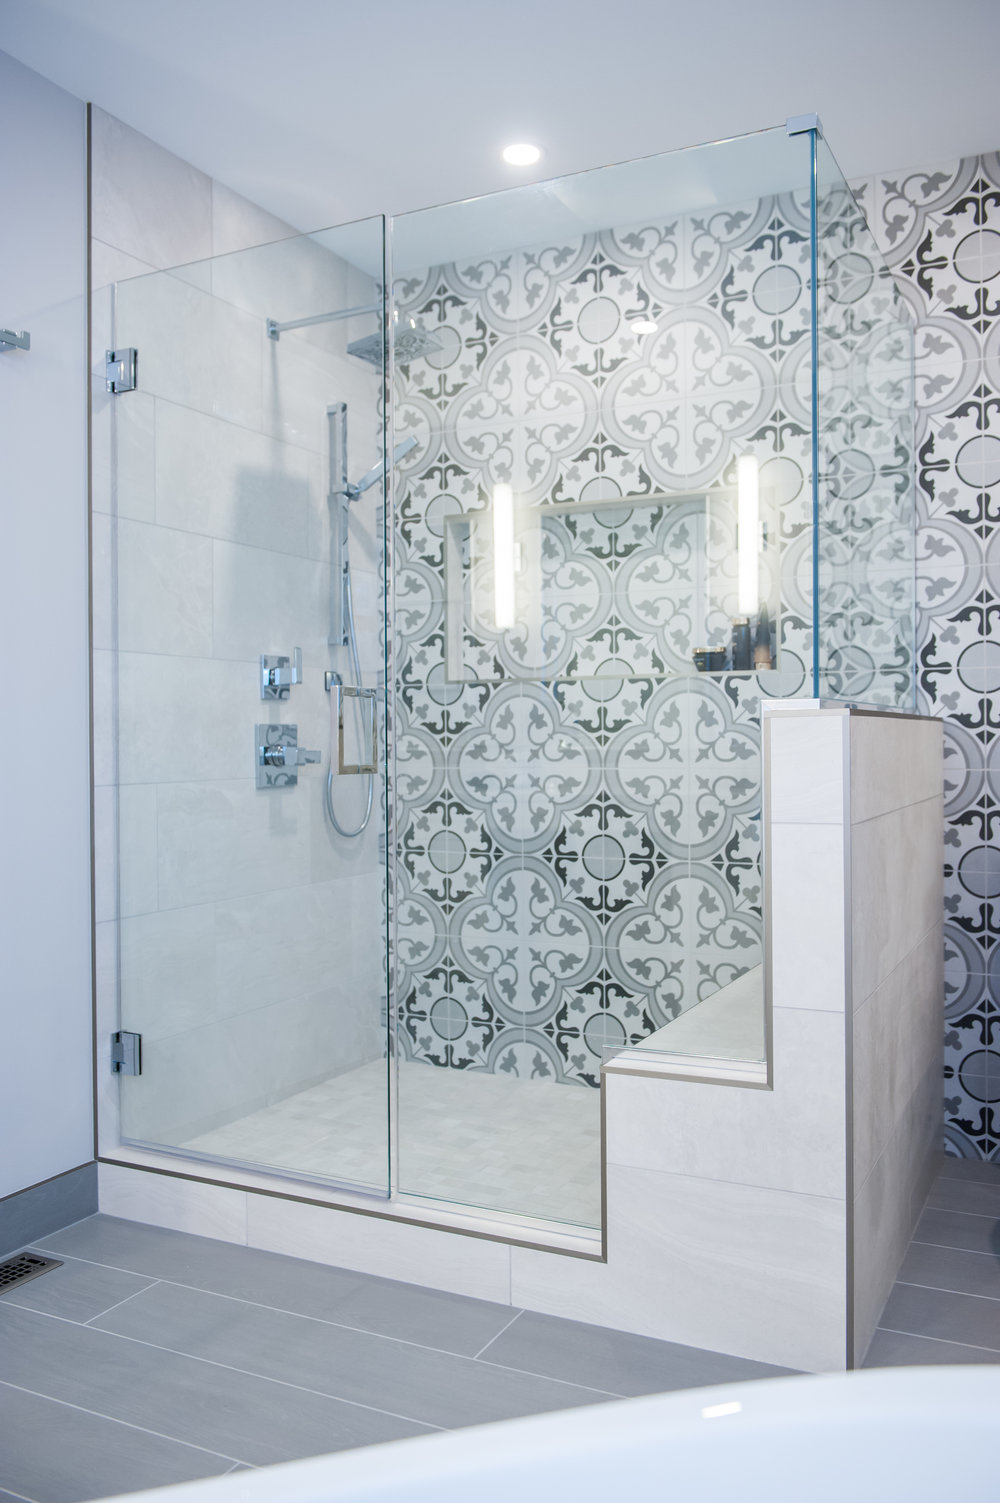 shower_glass_enclosure_mosaic